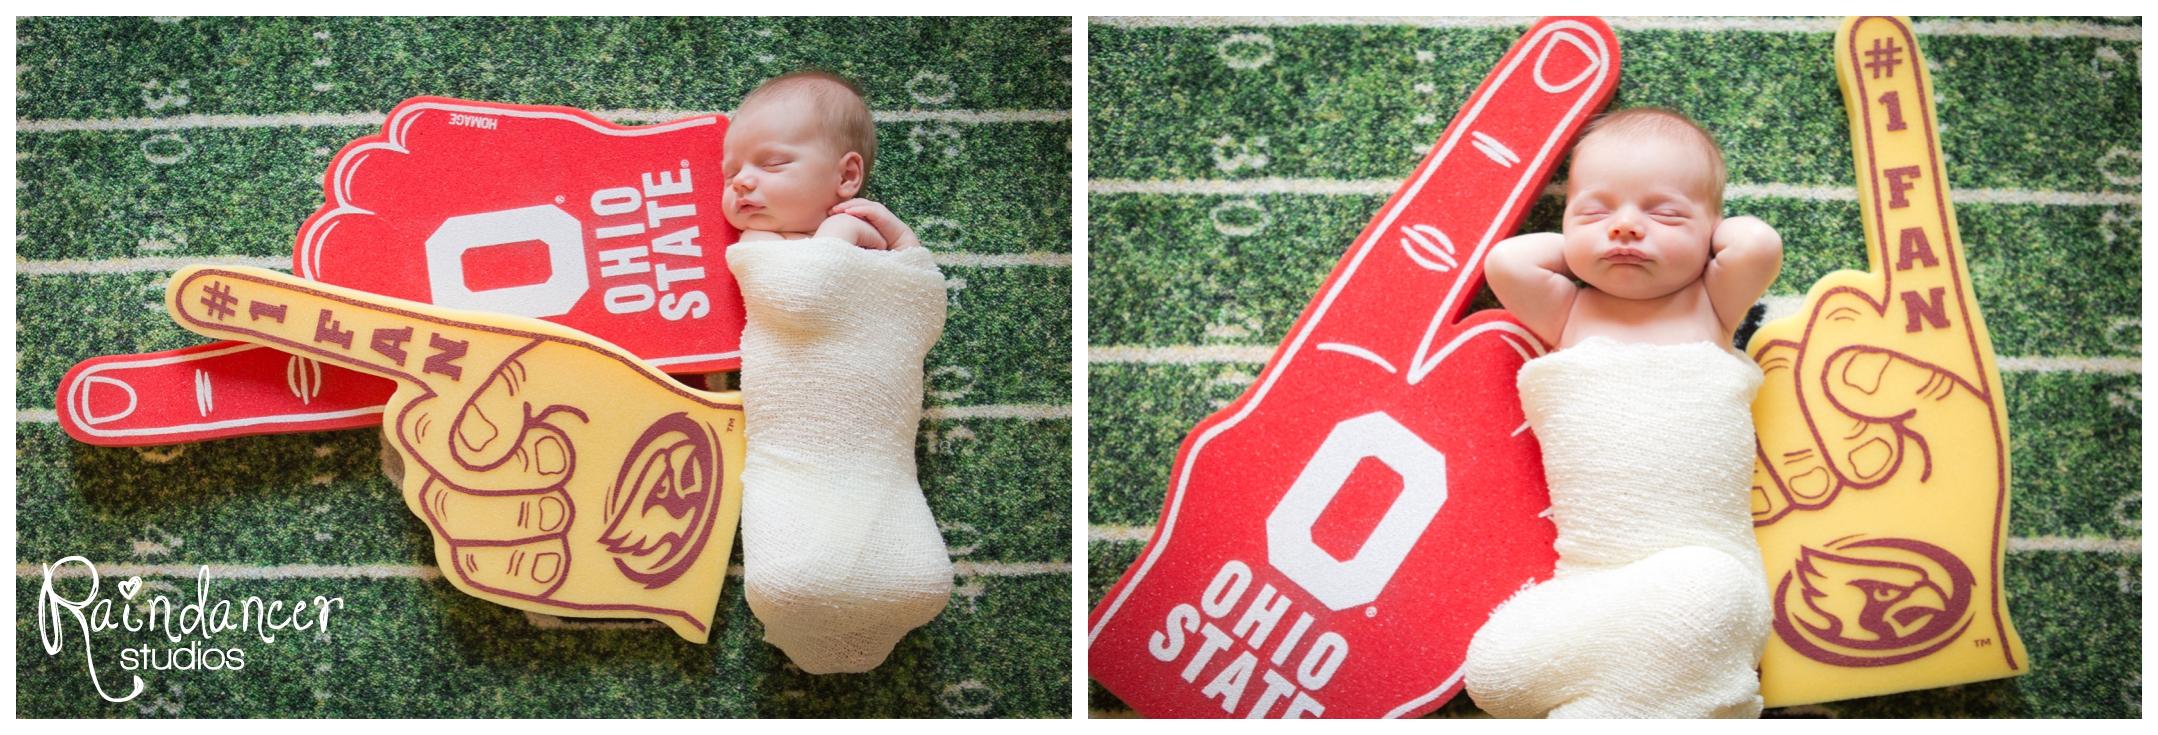 Indianapolis Newborn Photographer, Indianapolis Newborn Photography, Indianapolis Baby Photographer